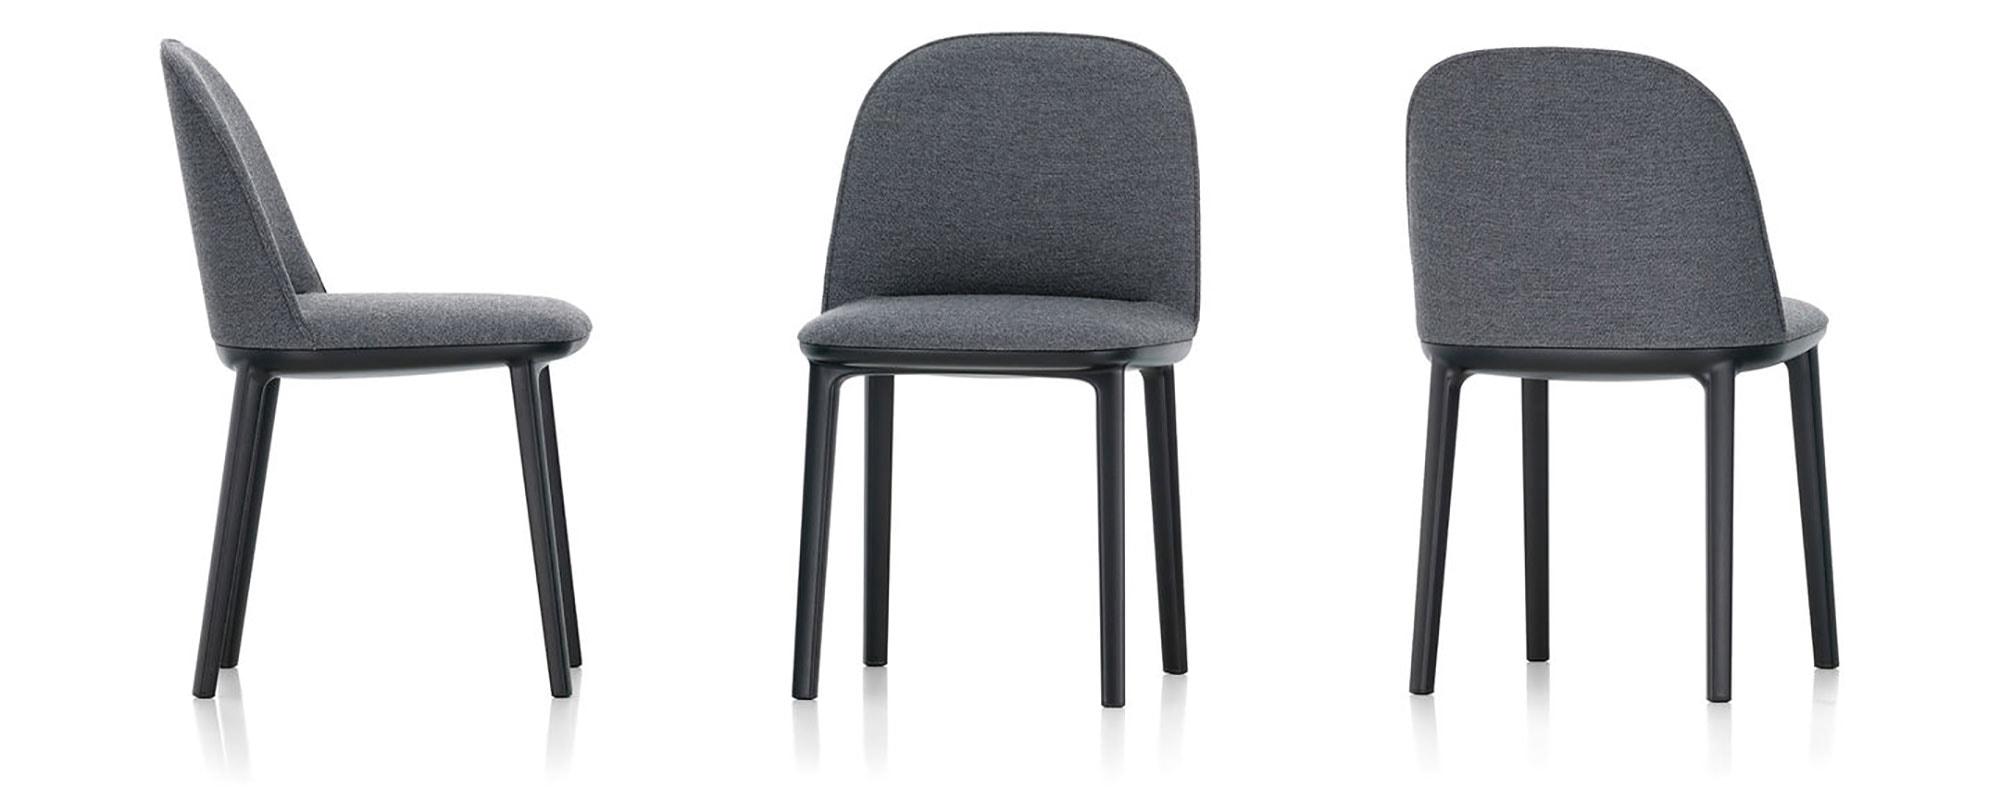 VITRA Softshell side chair gallery 1